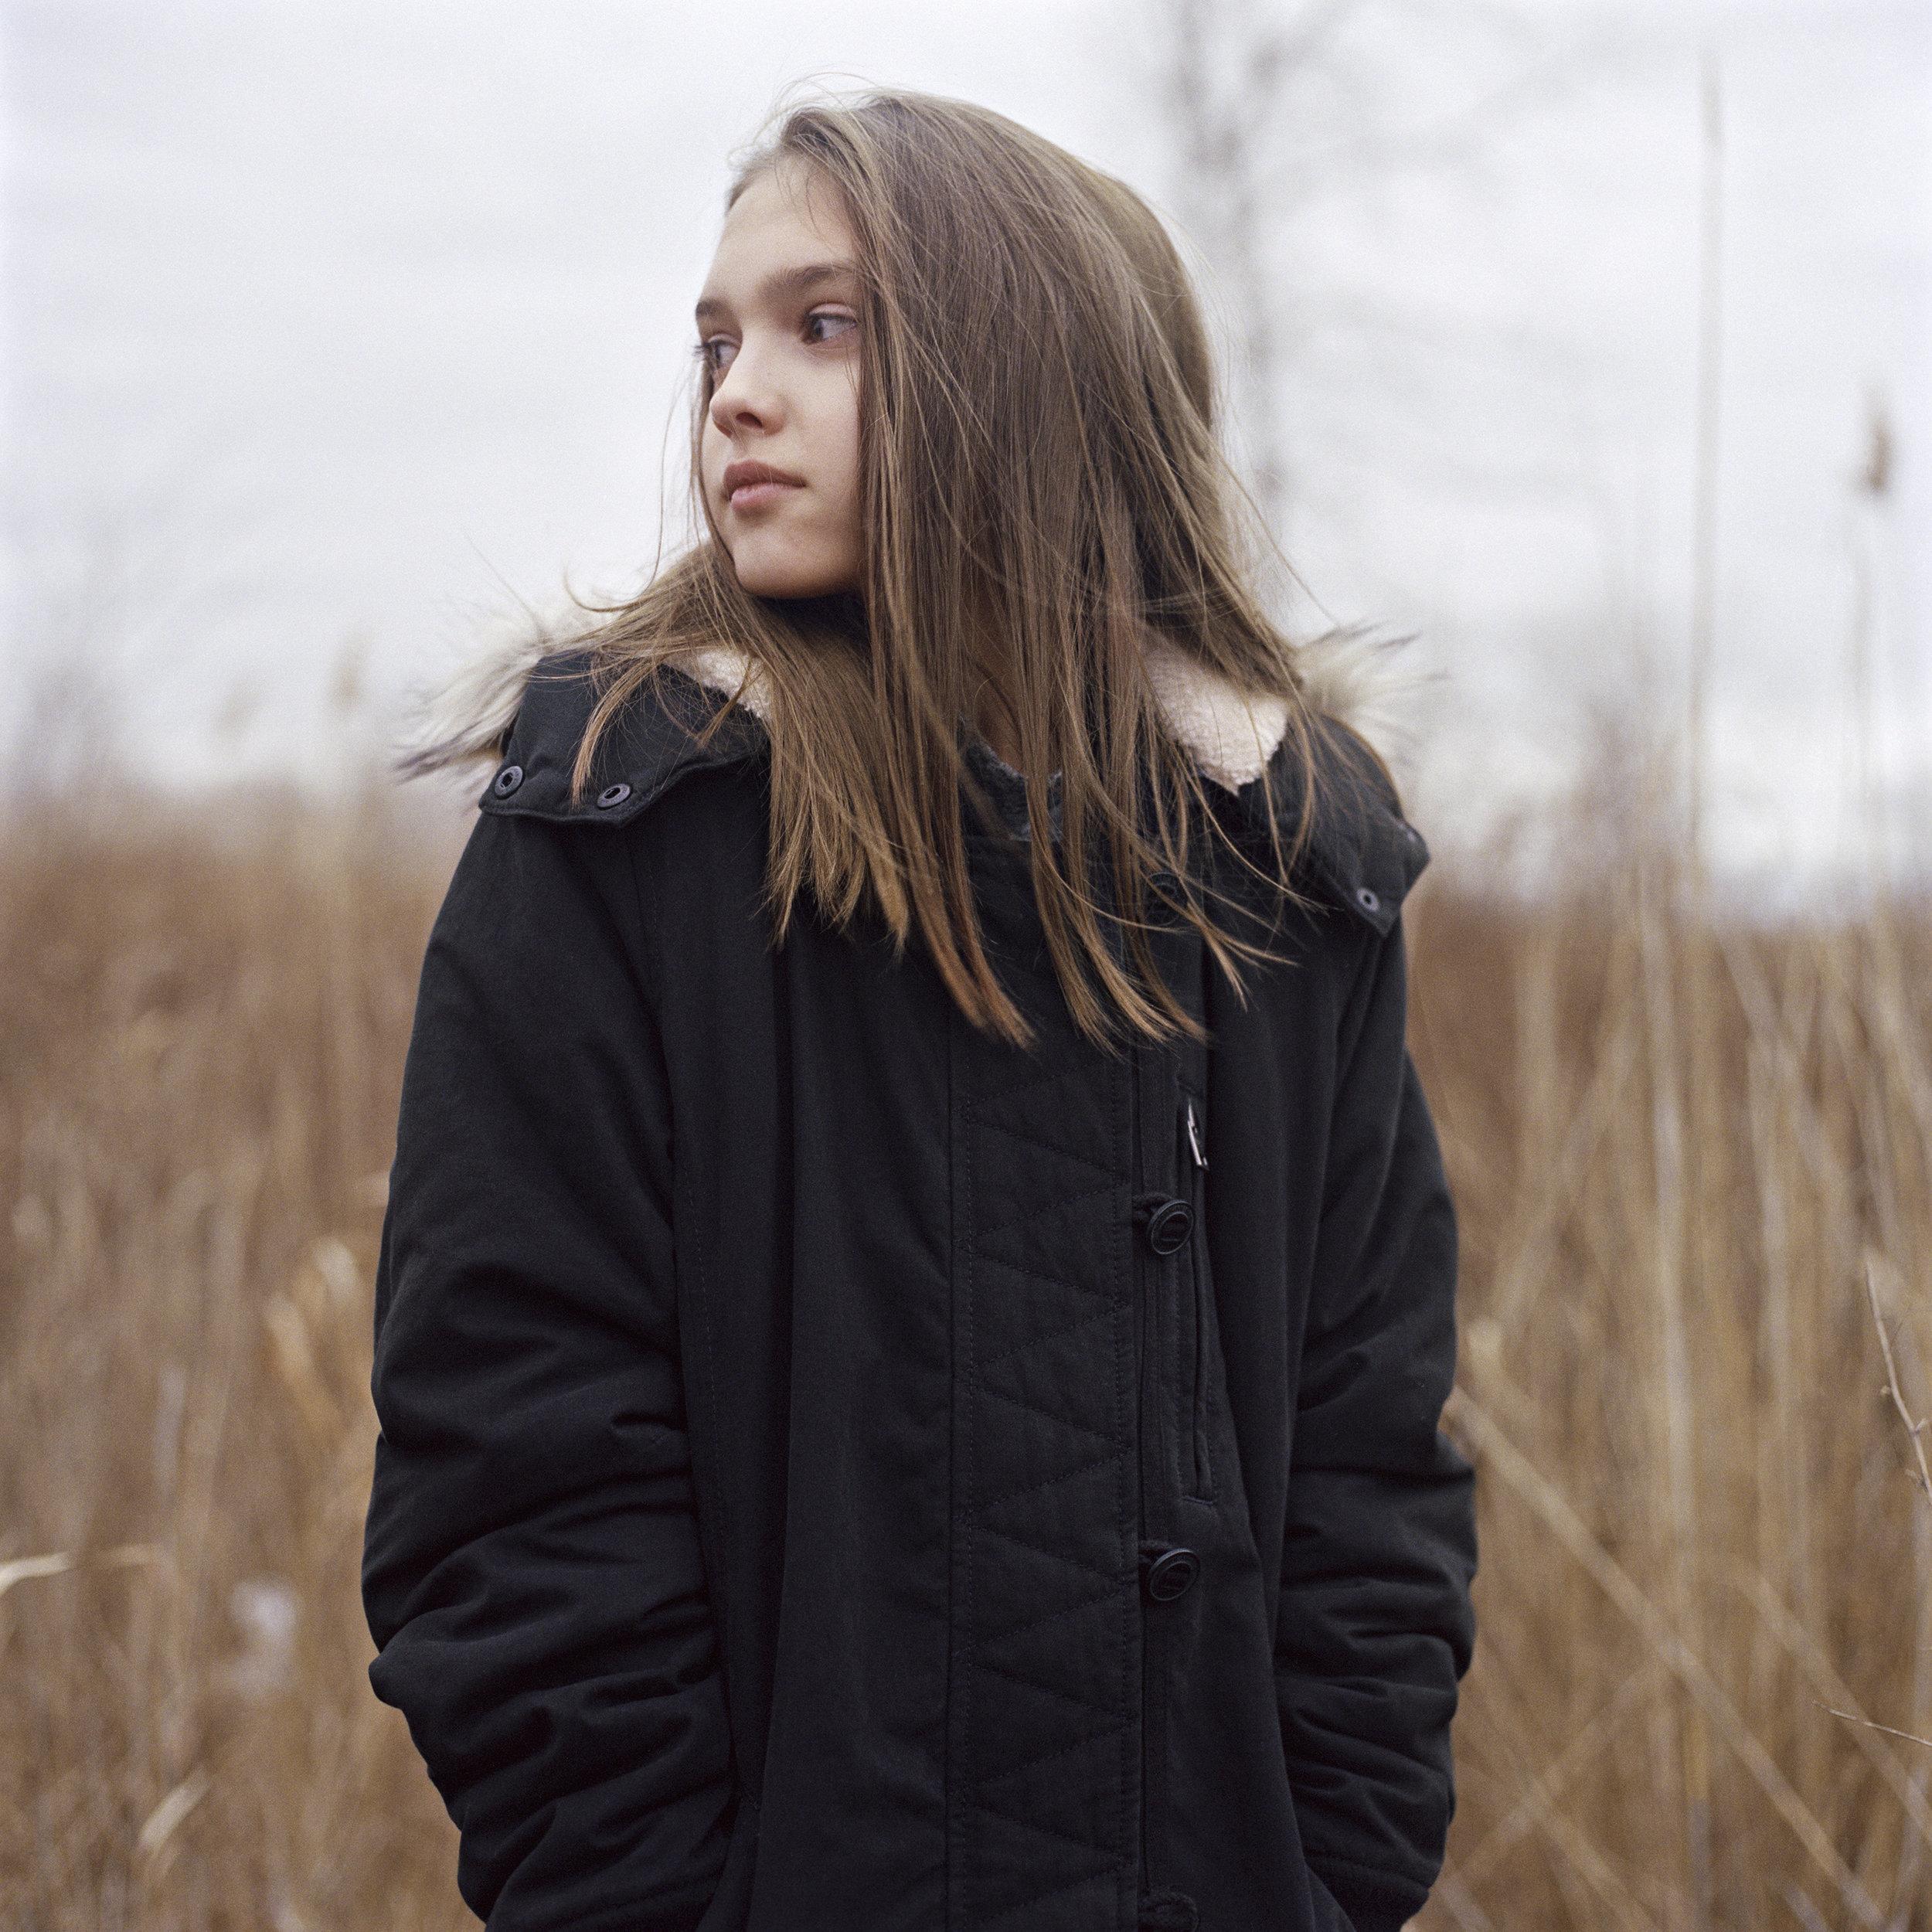 Zuzanna_Fall Portrait.jpg